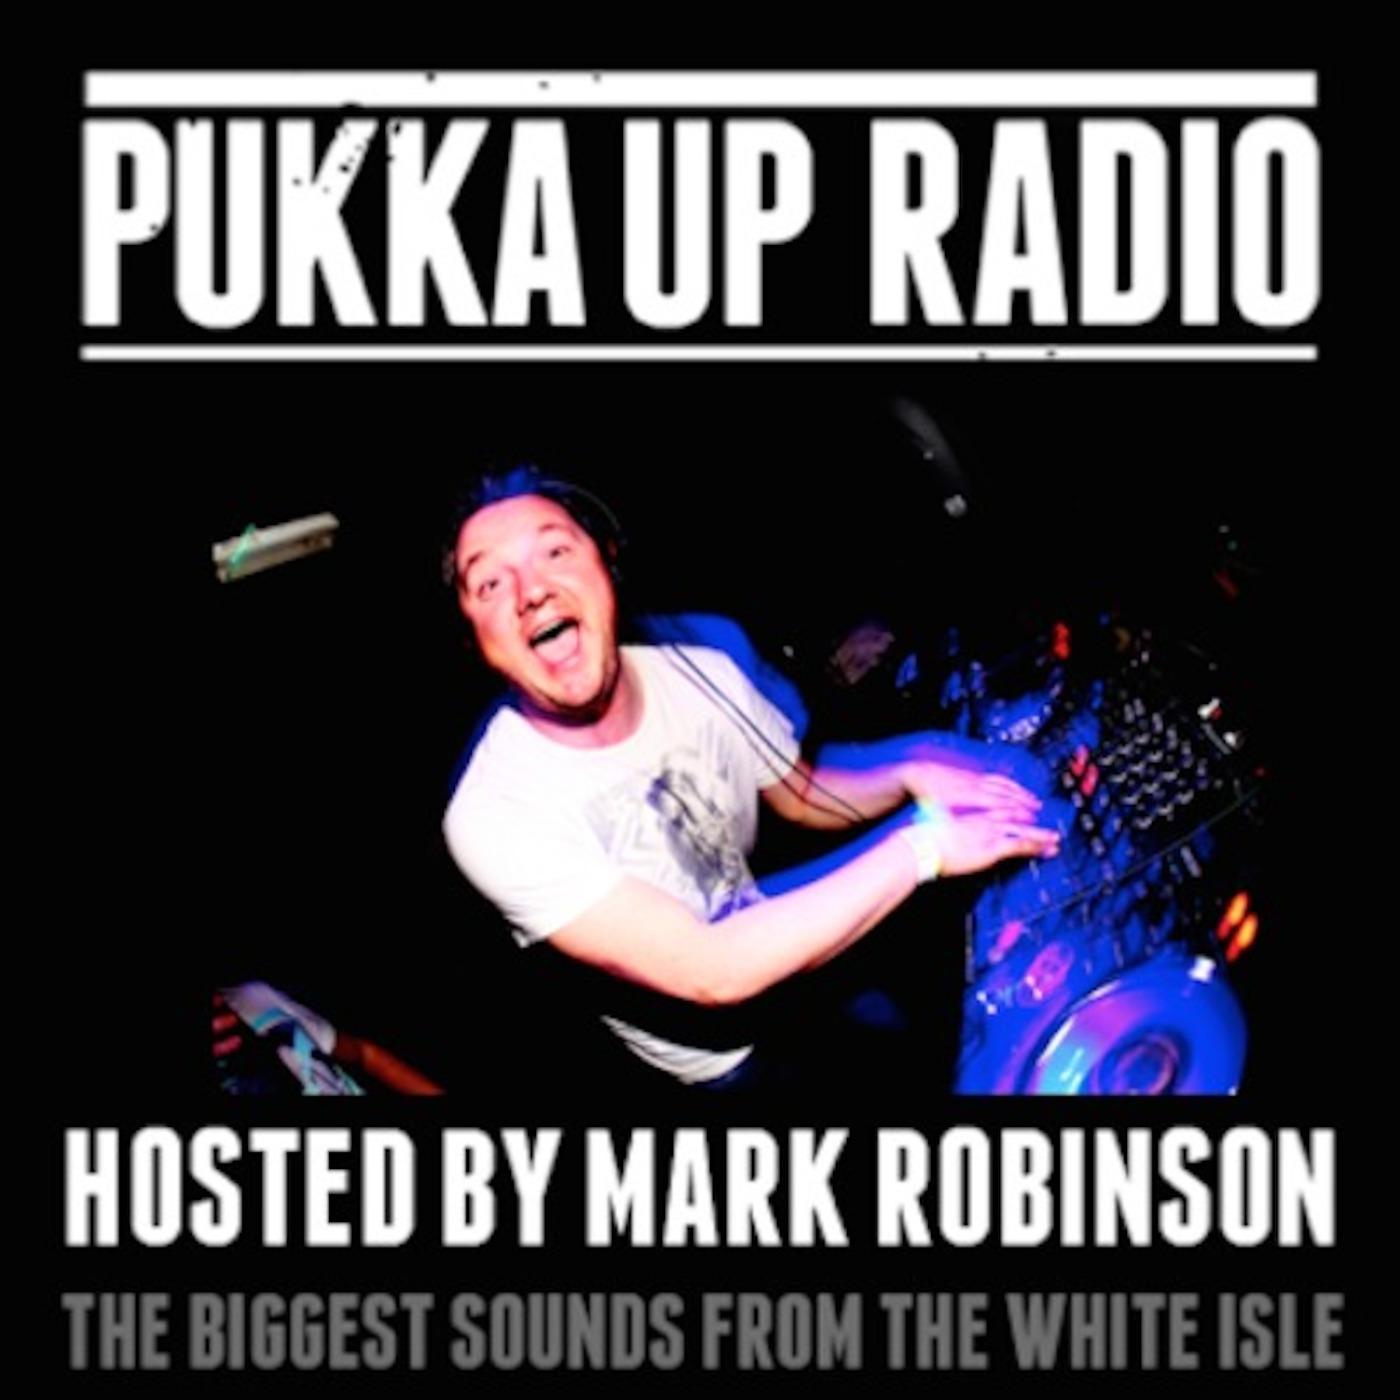 Pukka Up Global Radio with Mark Robinson